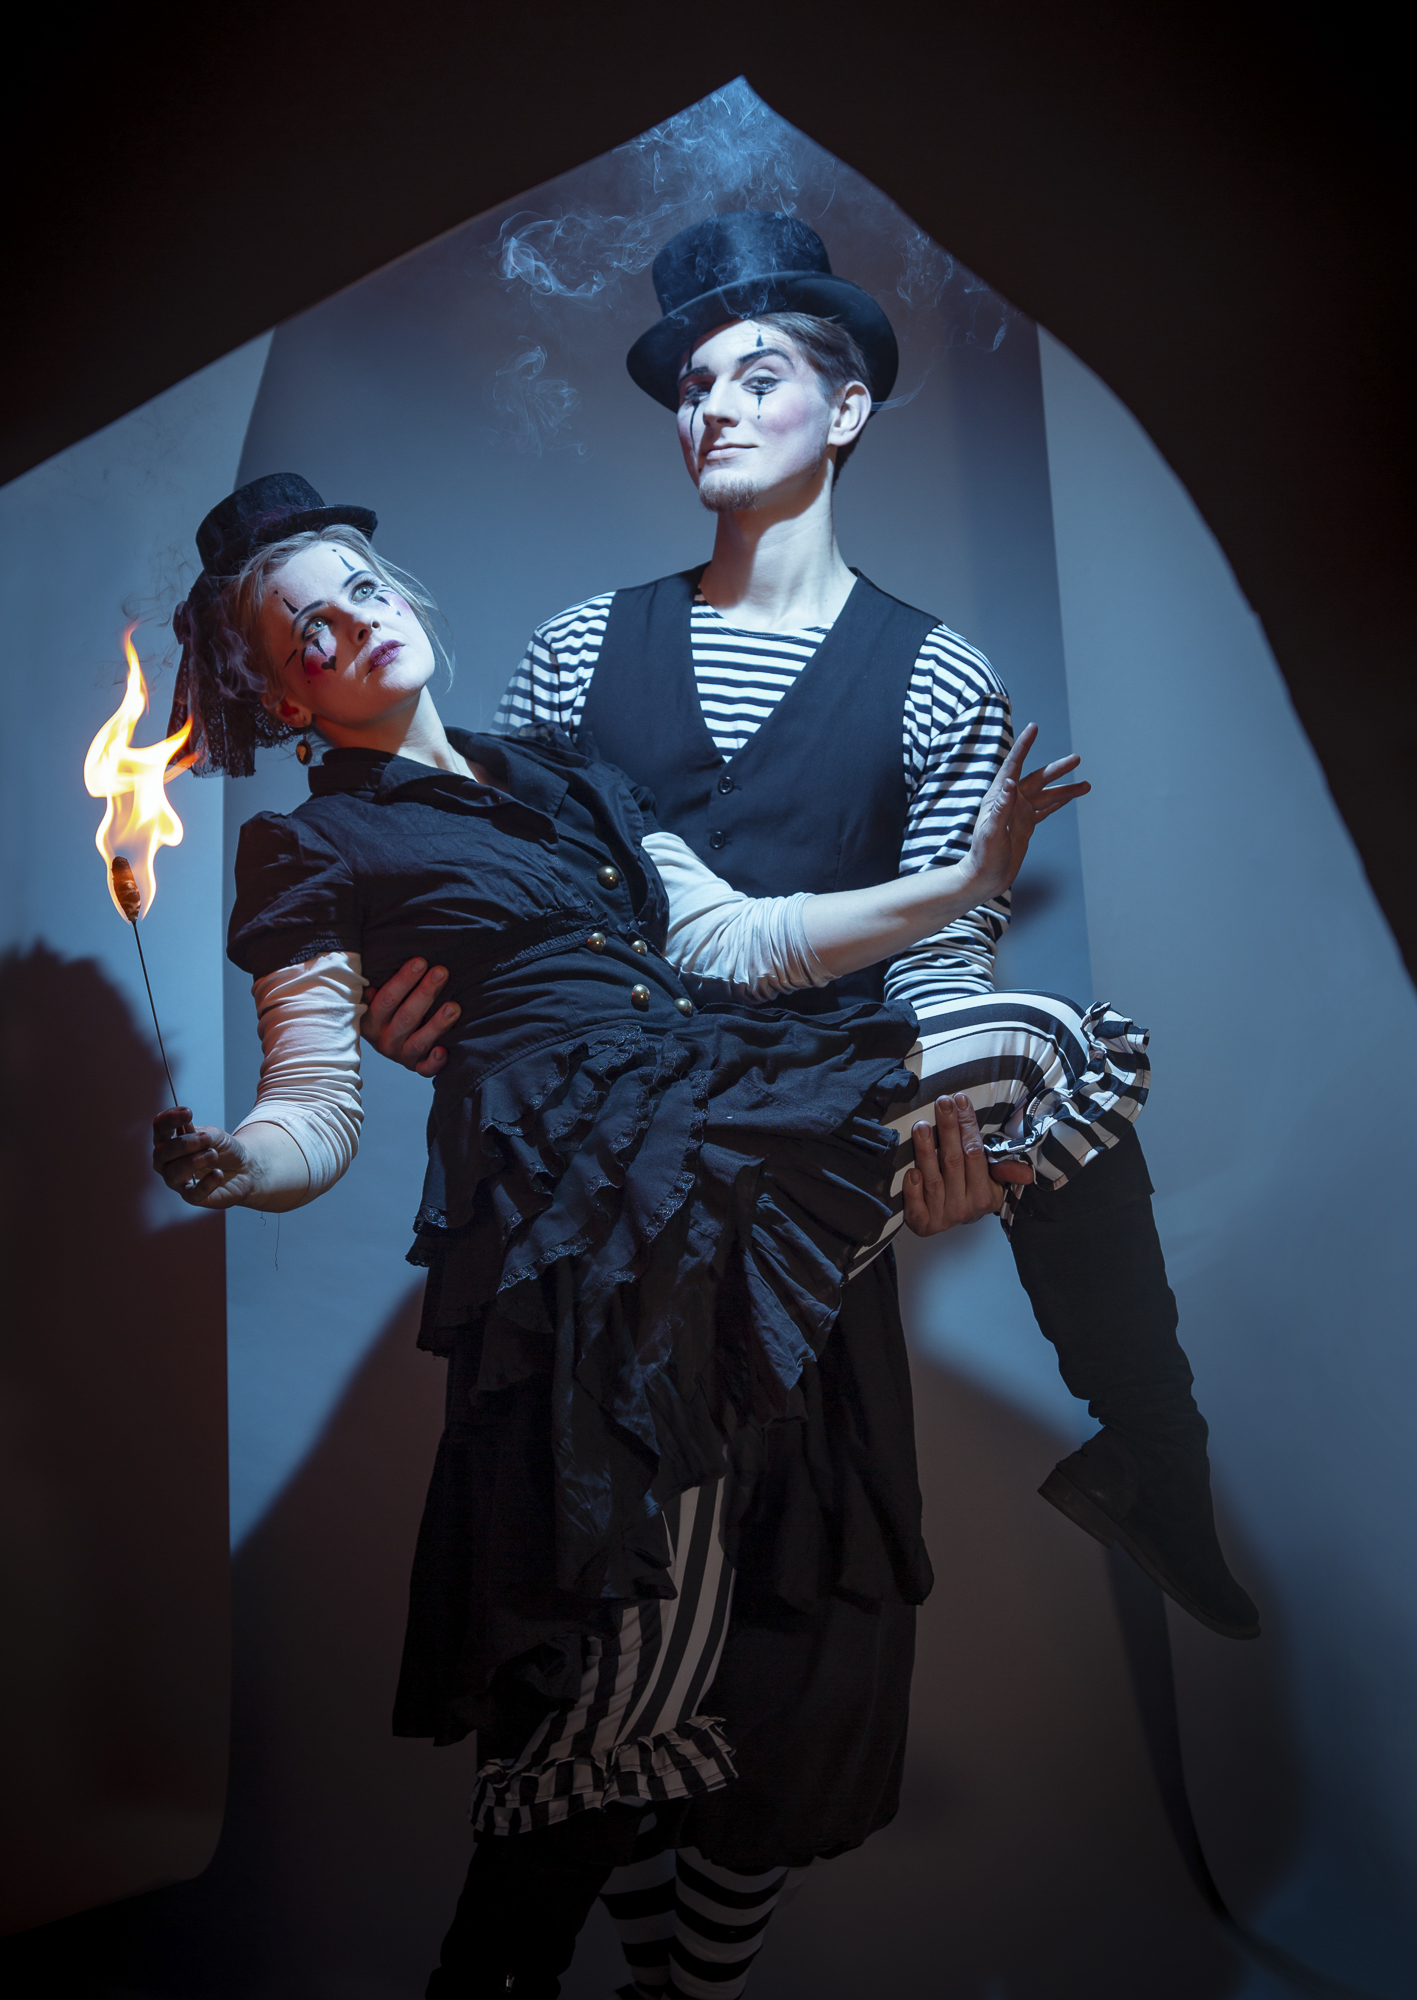 Kalendershooting | Scherenschnitt | Cirque | Eike | Selbstportrait